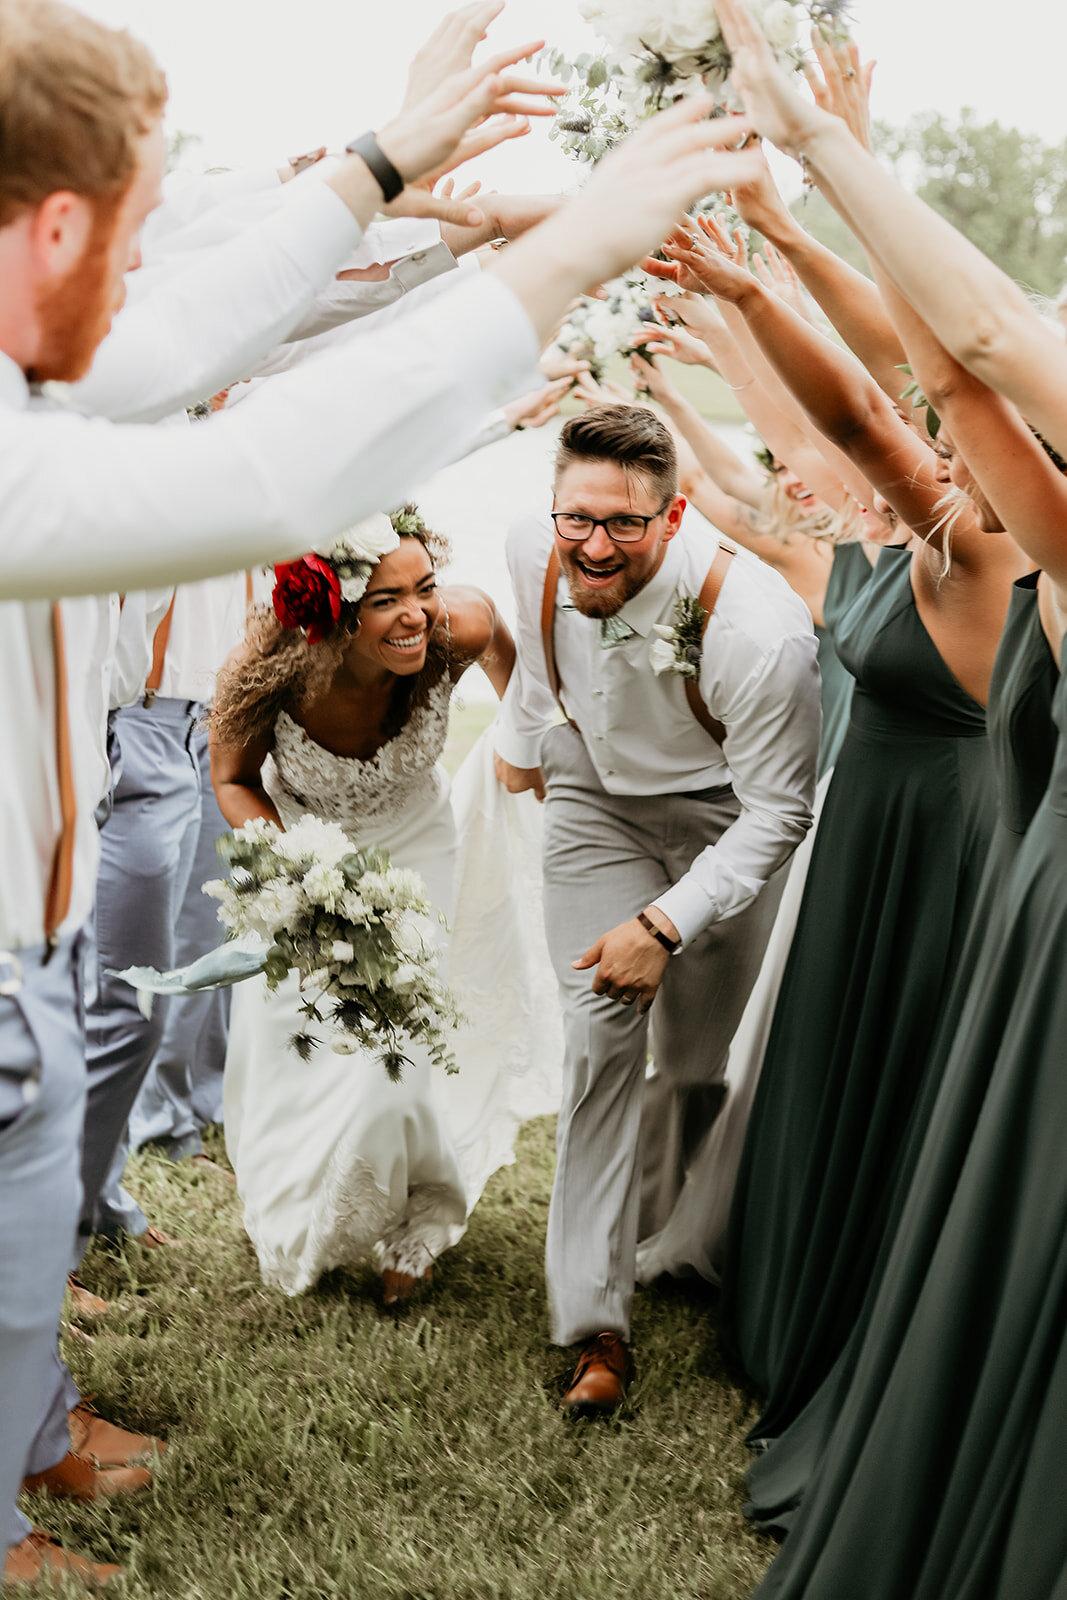 august-wolf-floral-design-des-moines-wedding-florist-flowers-ames-ia-boho-bride-flower-crown-green-bridesmaids-dresses-eucalyptus.jpg